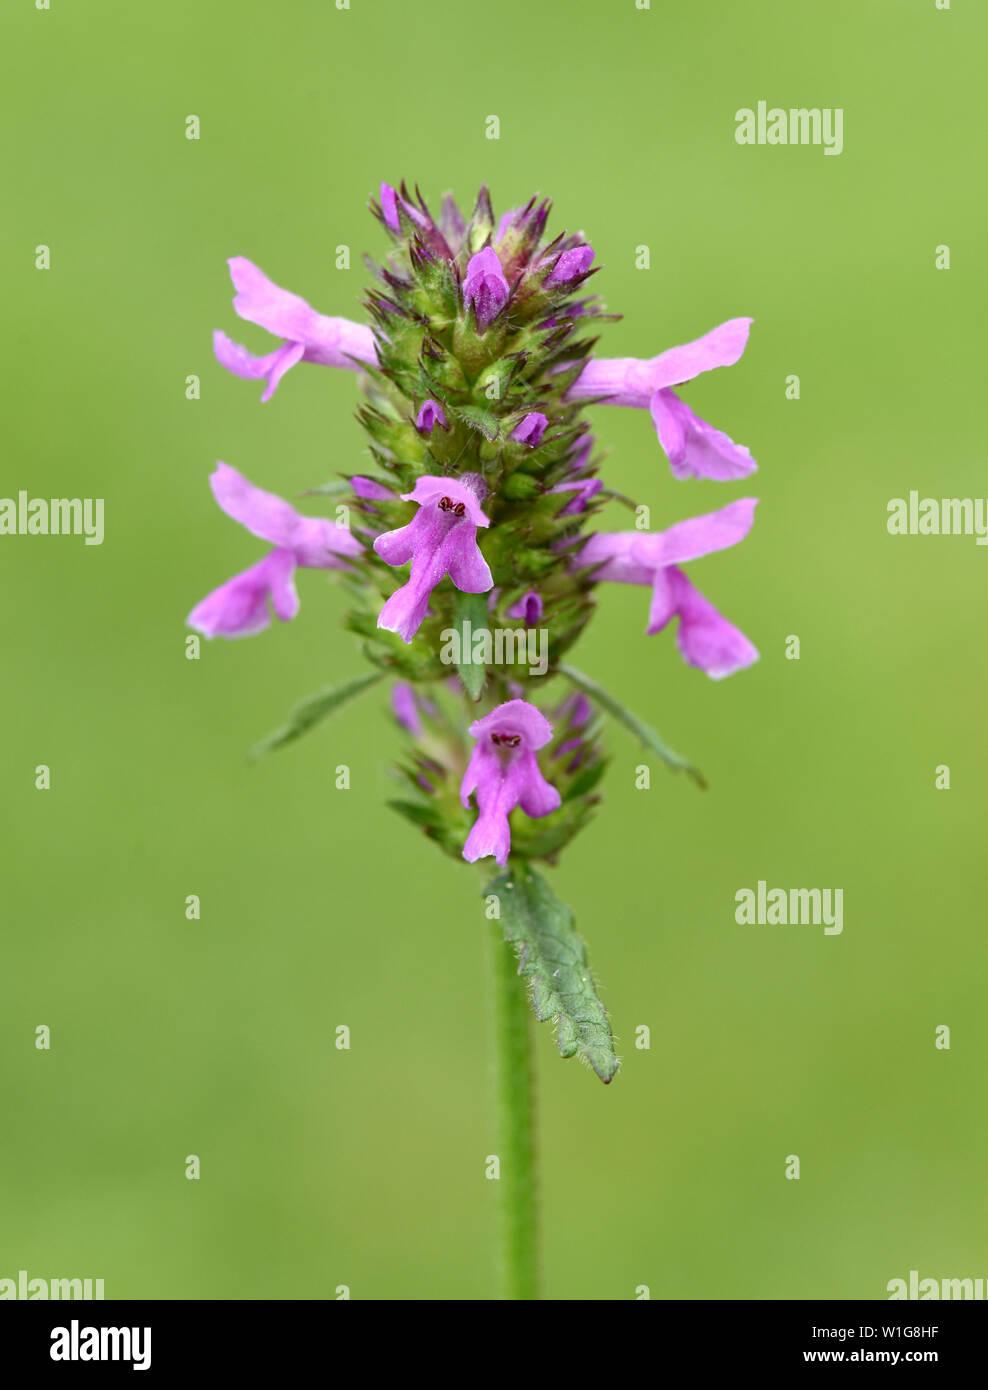 Ziest, Stachys, officinalis, Echter, Heilziest Stock Photo